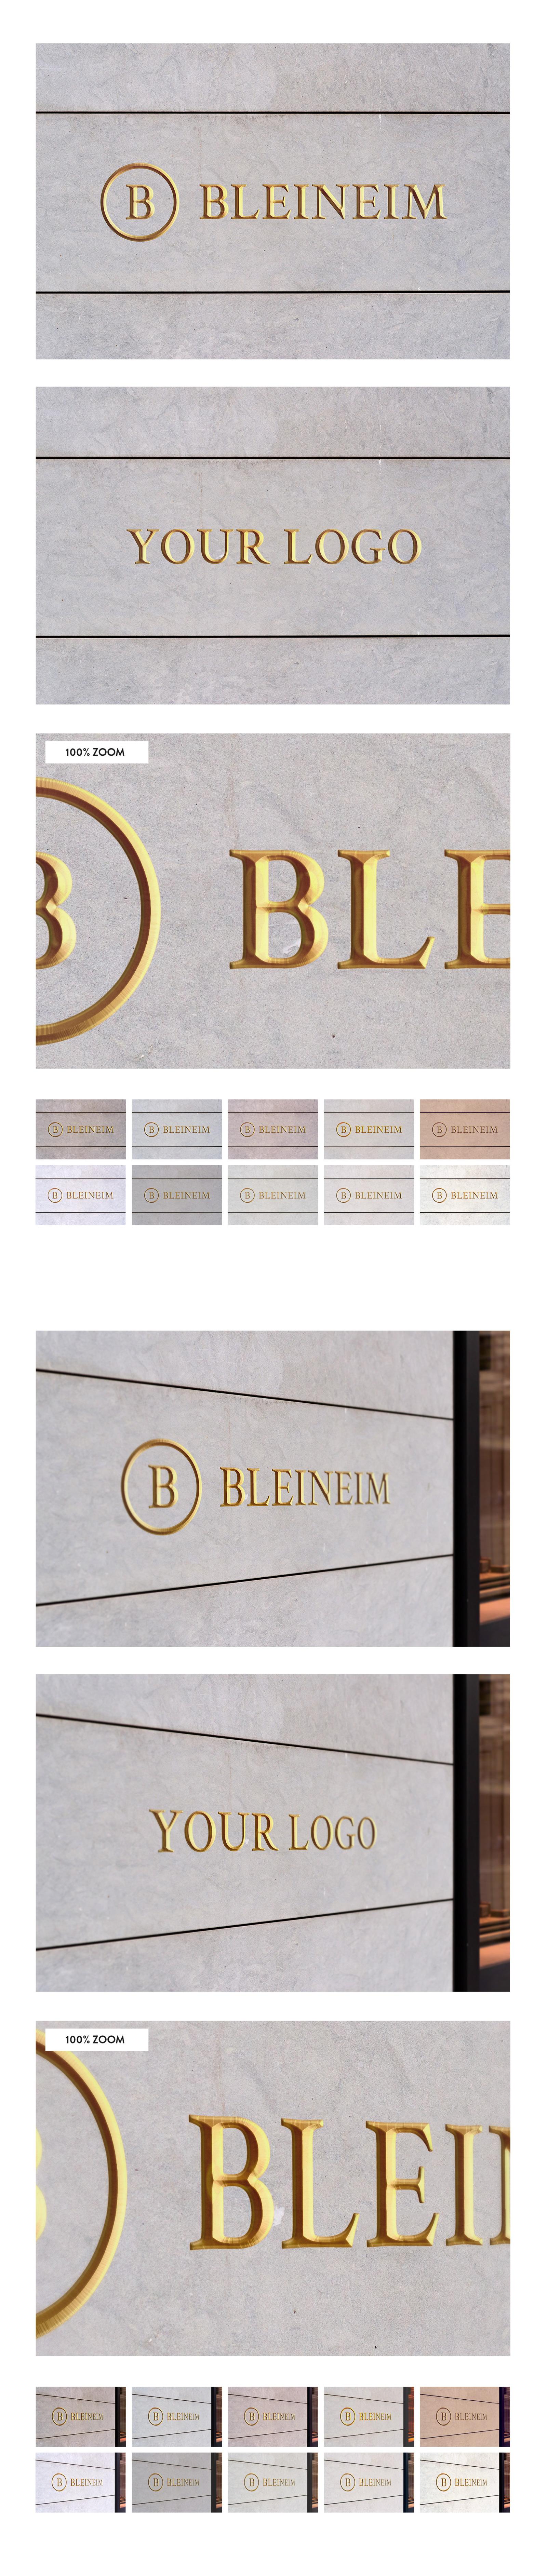 50 sign facade logo mockup template bundle 2